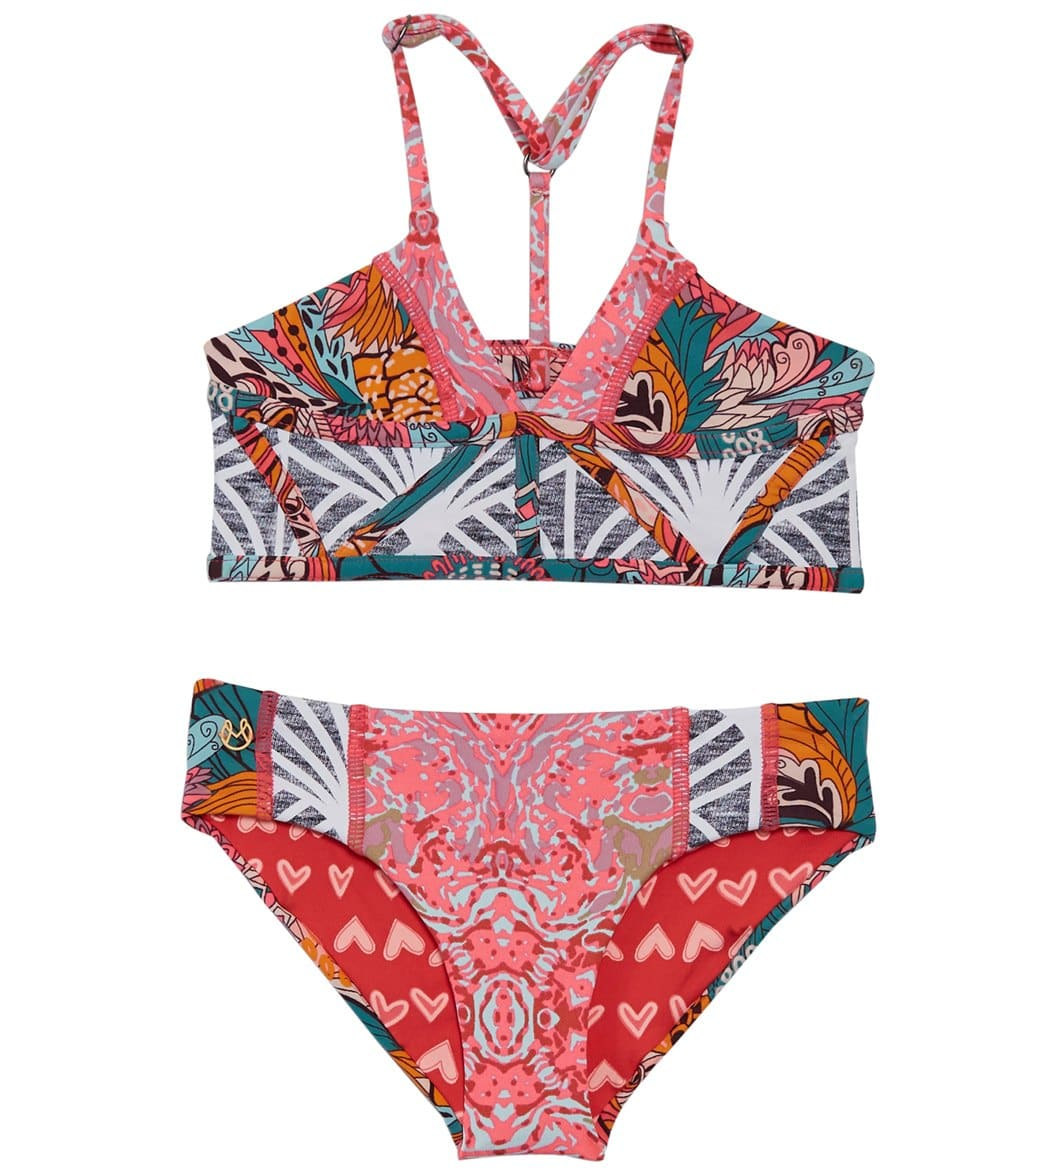 Maaji Girls  Pintastic Party Sugar Bloom Bikini Set (2-16) at  SwimOutlet.com - Free Shipping 5f8966f833bf